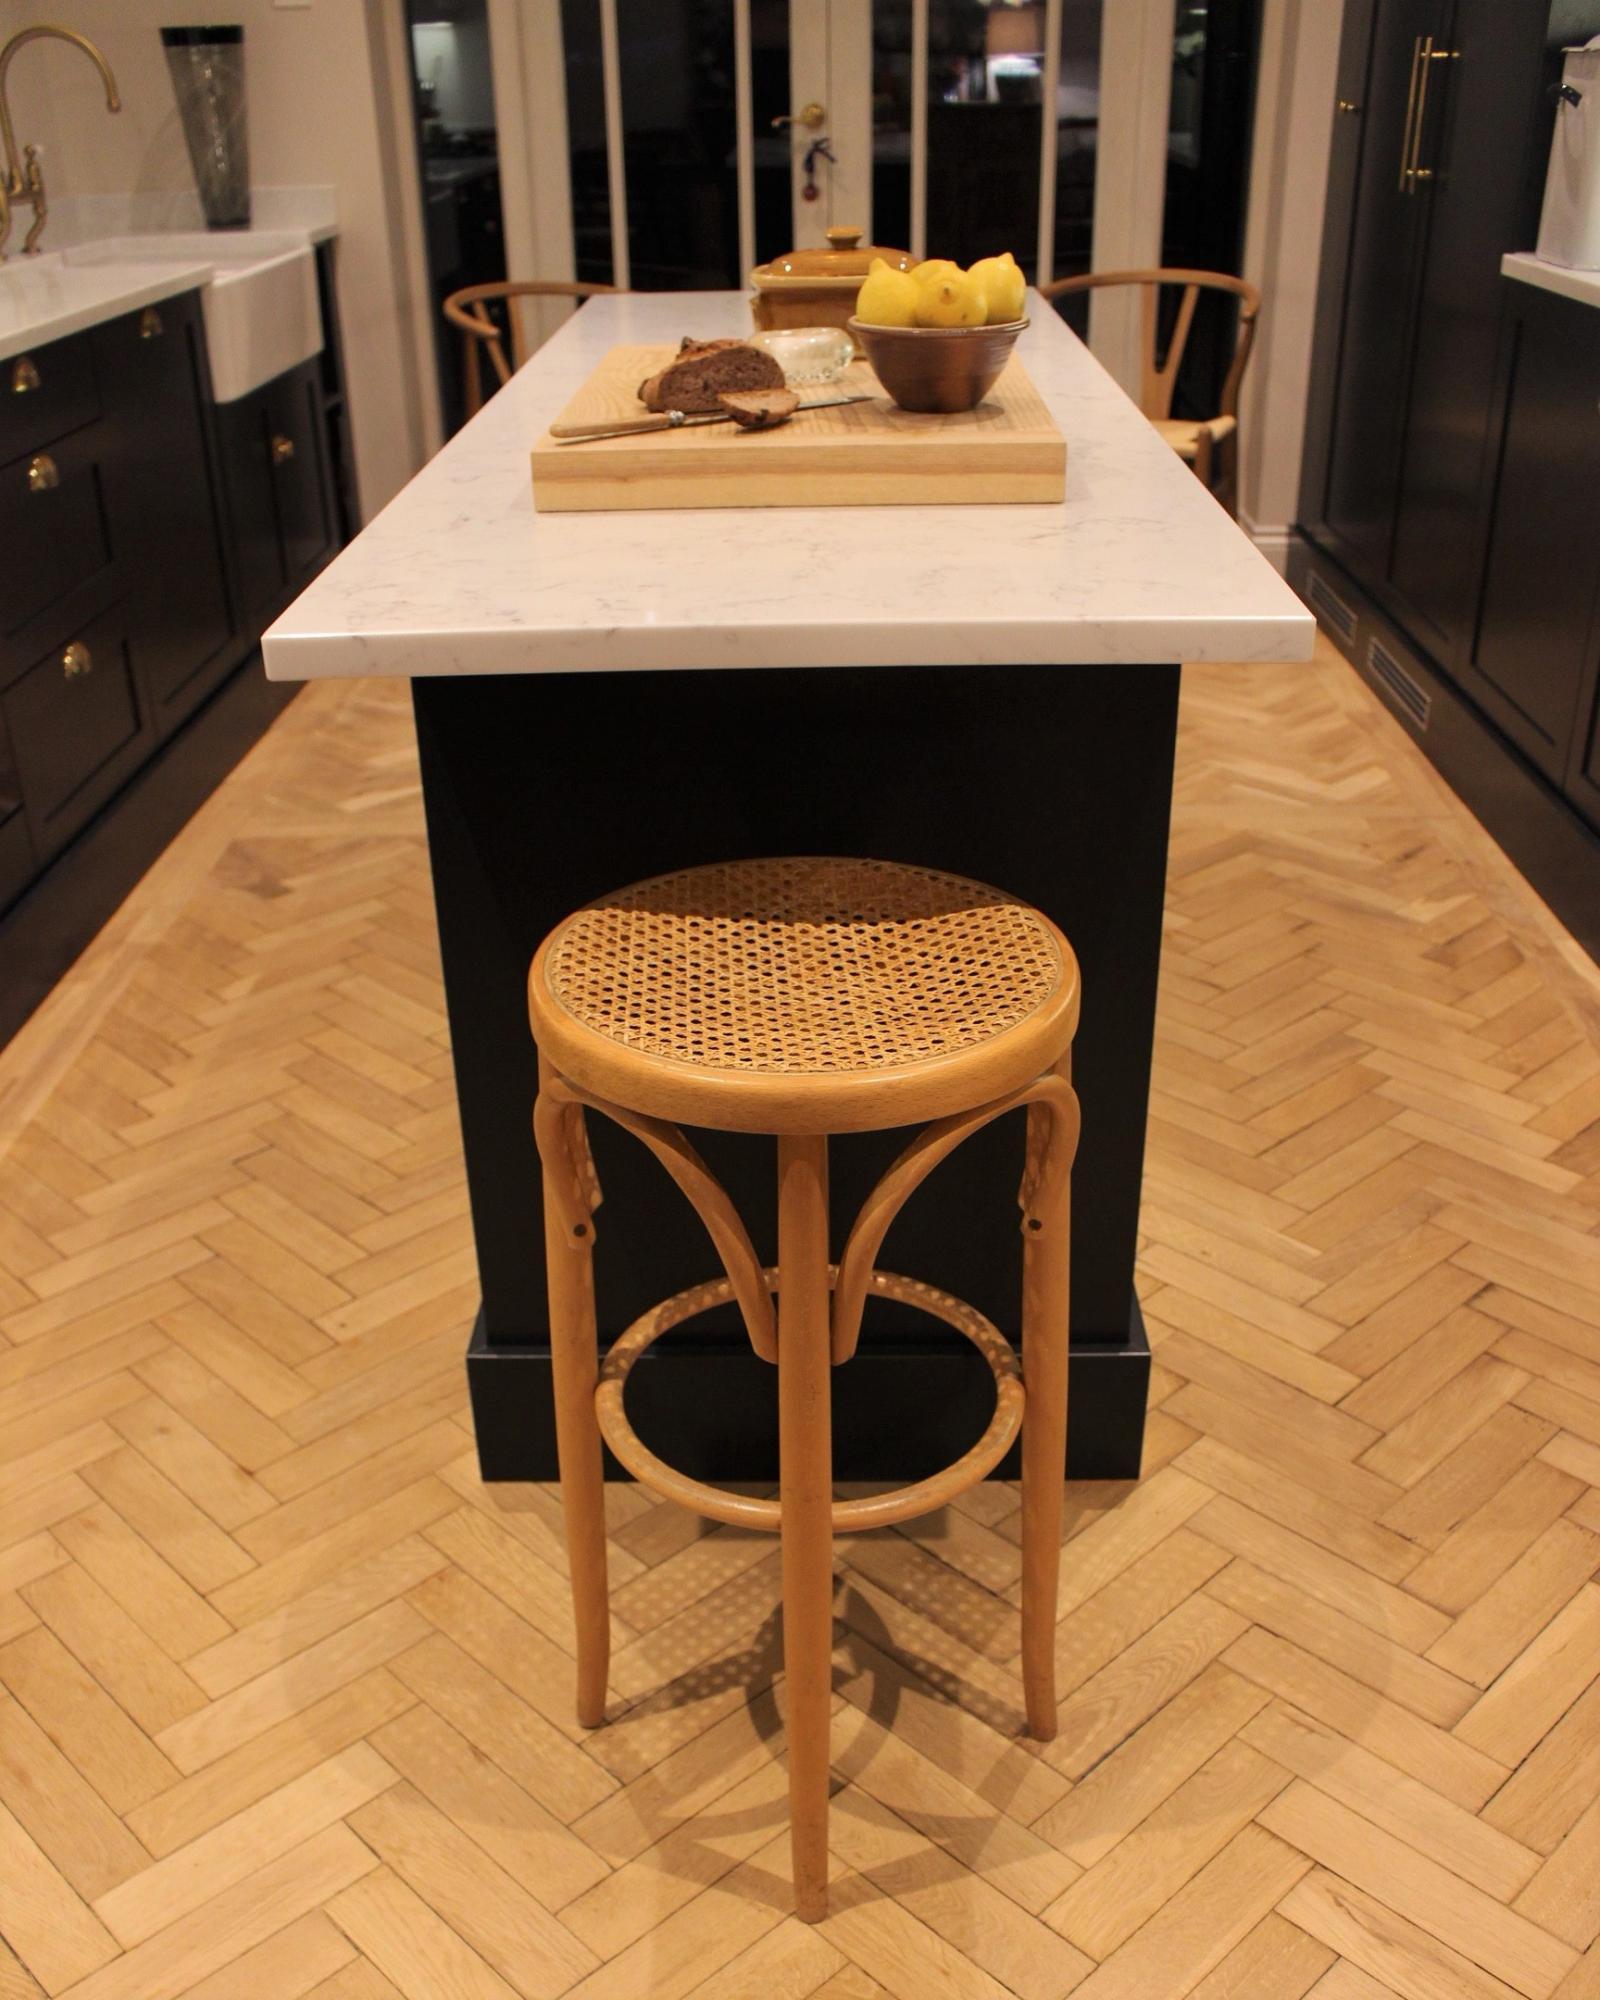 Kitchen Design Inspiration - navy island and chopping block